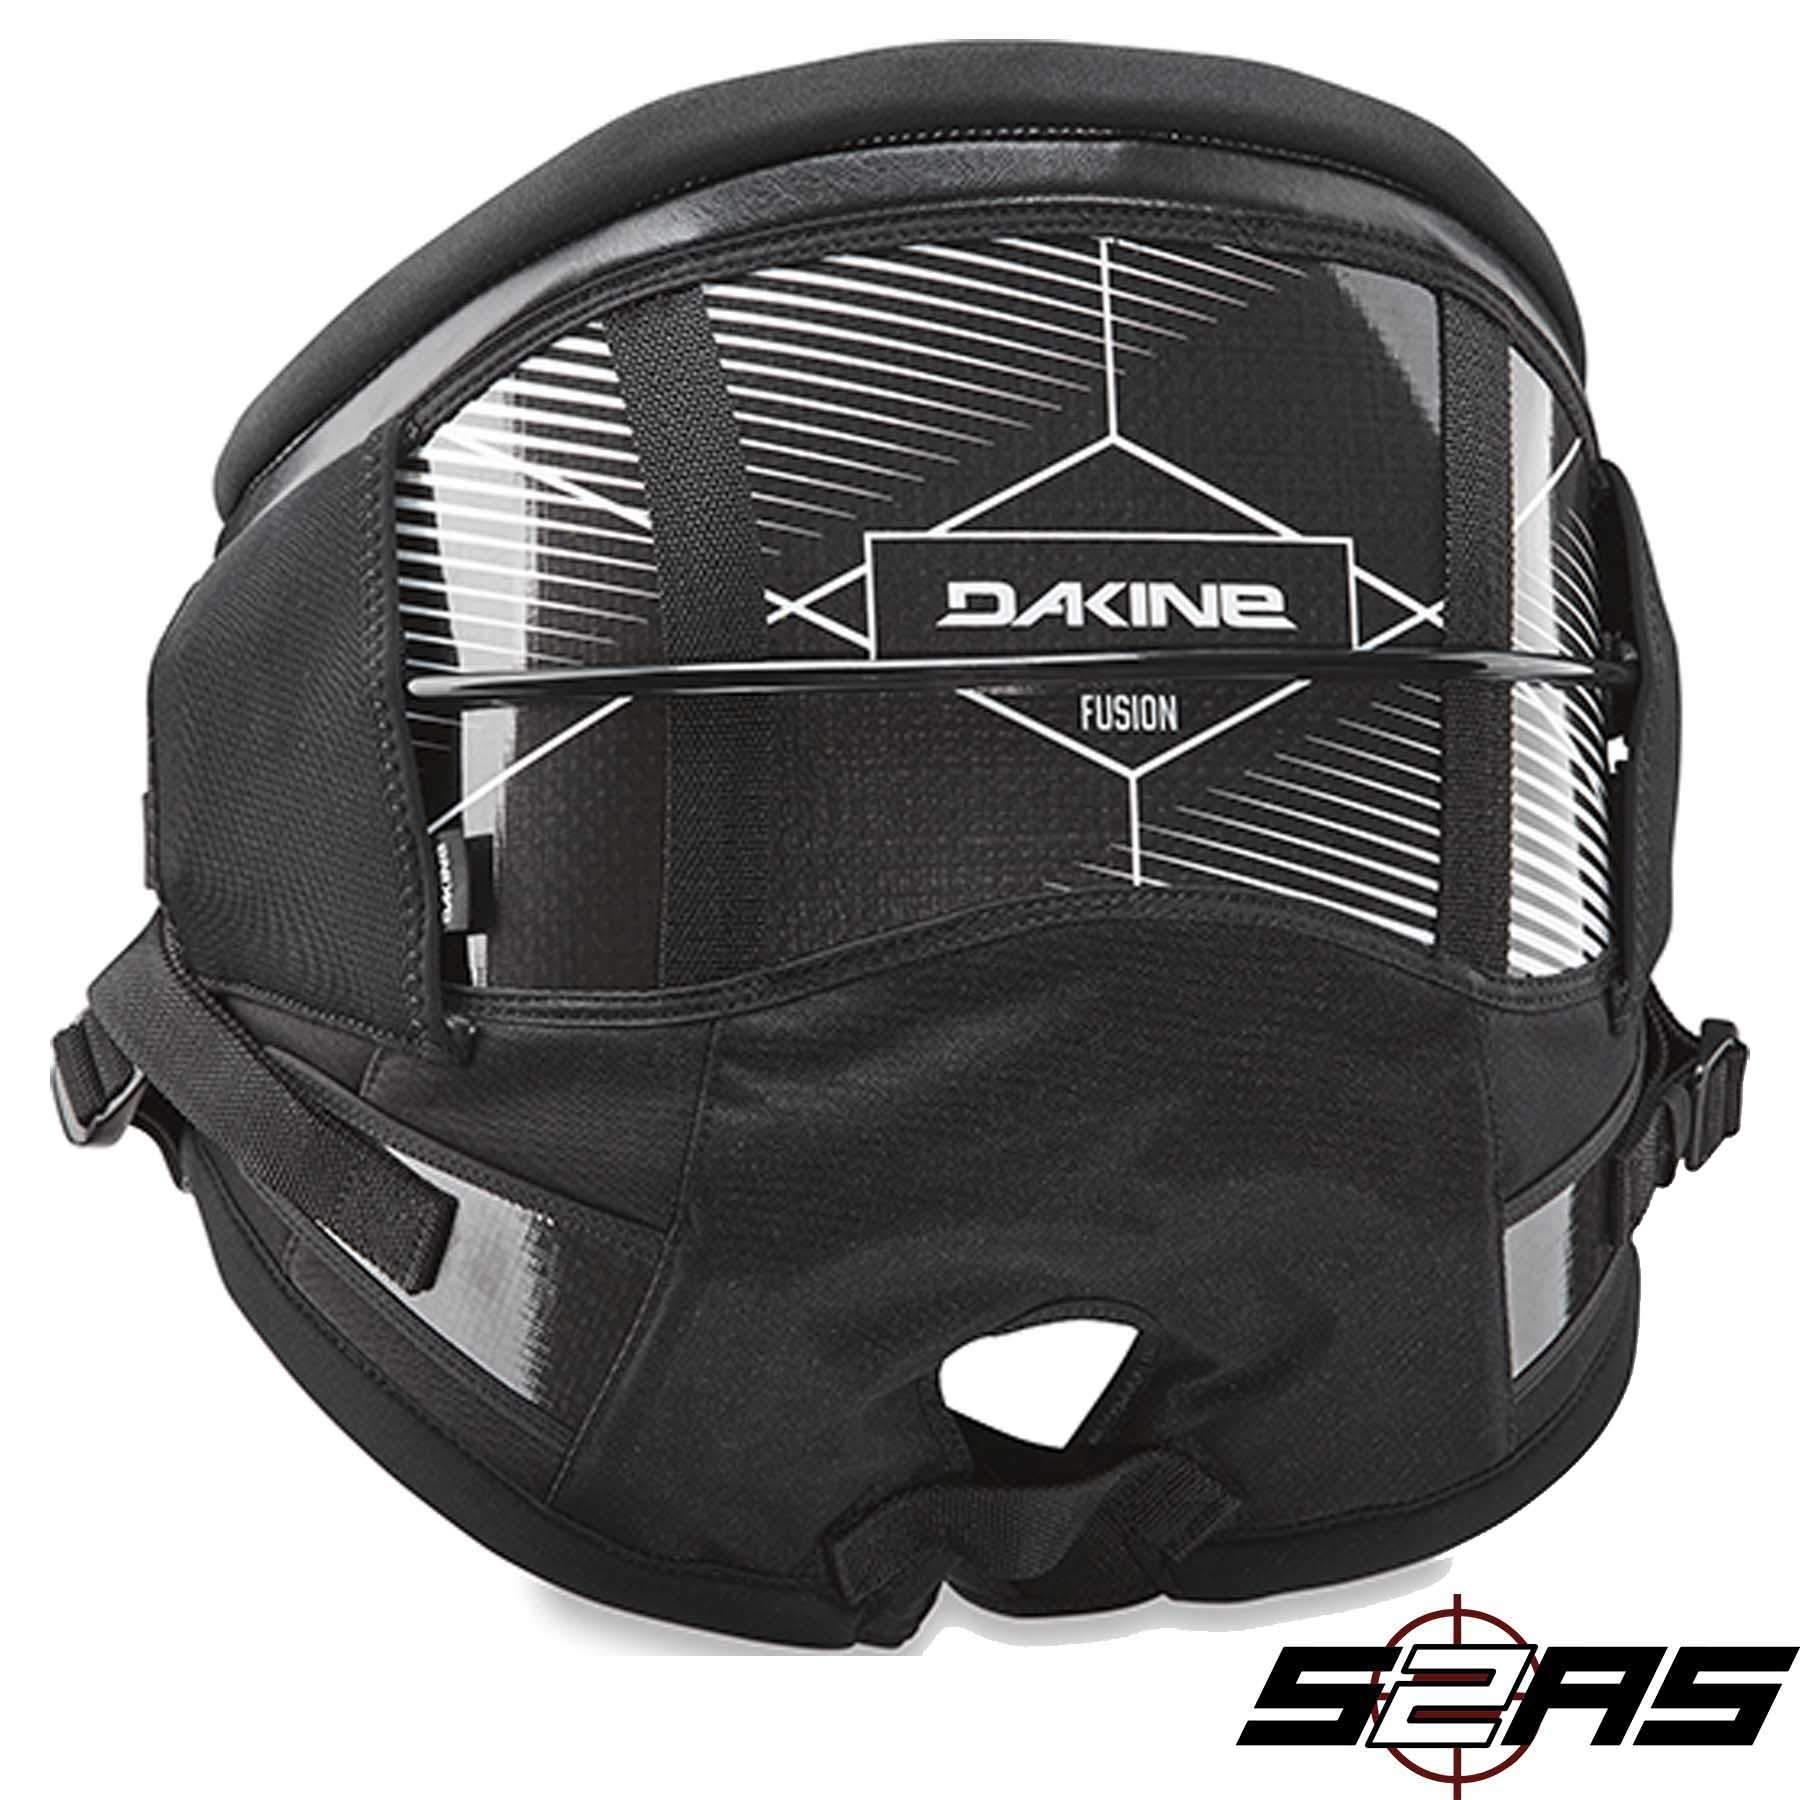 Dakine 10001842 Men's Fusion Kiteboard Harness, Black - XS